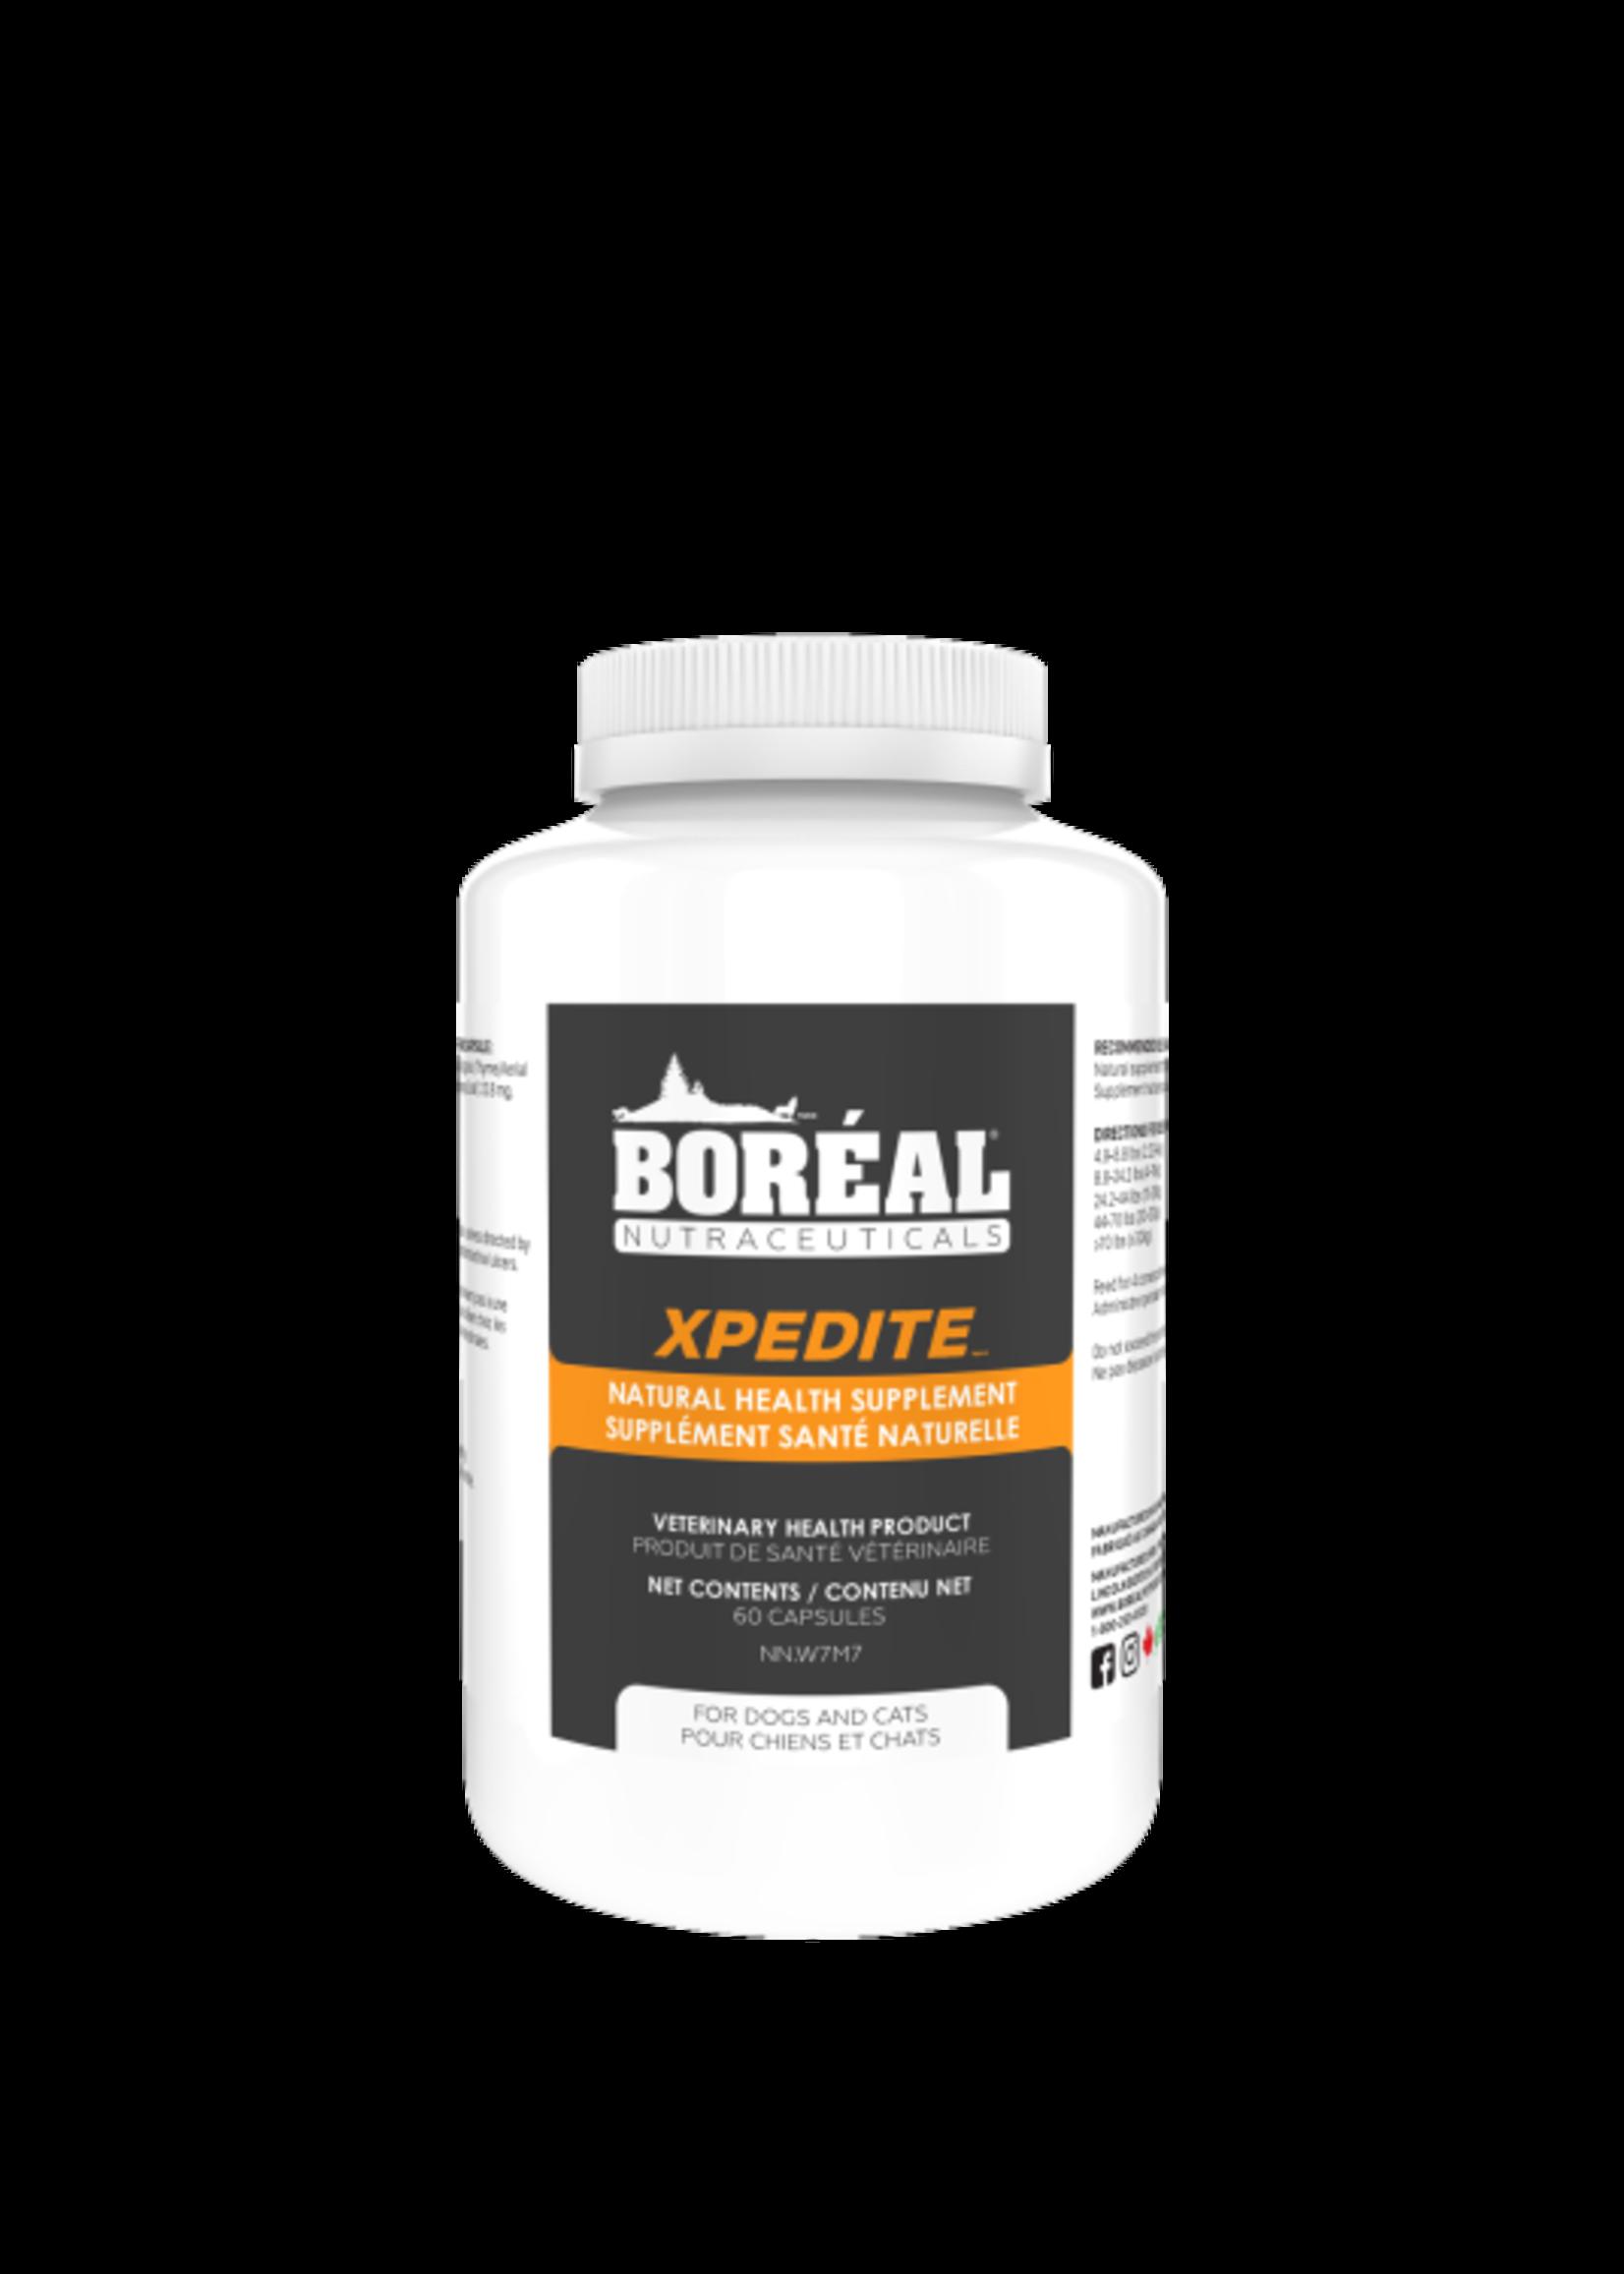 Boreal EPEDITE Natural Health Supplement - 60 Capsules